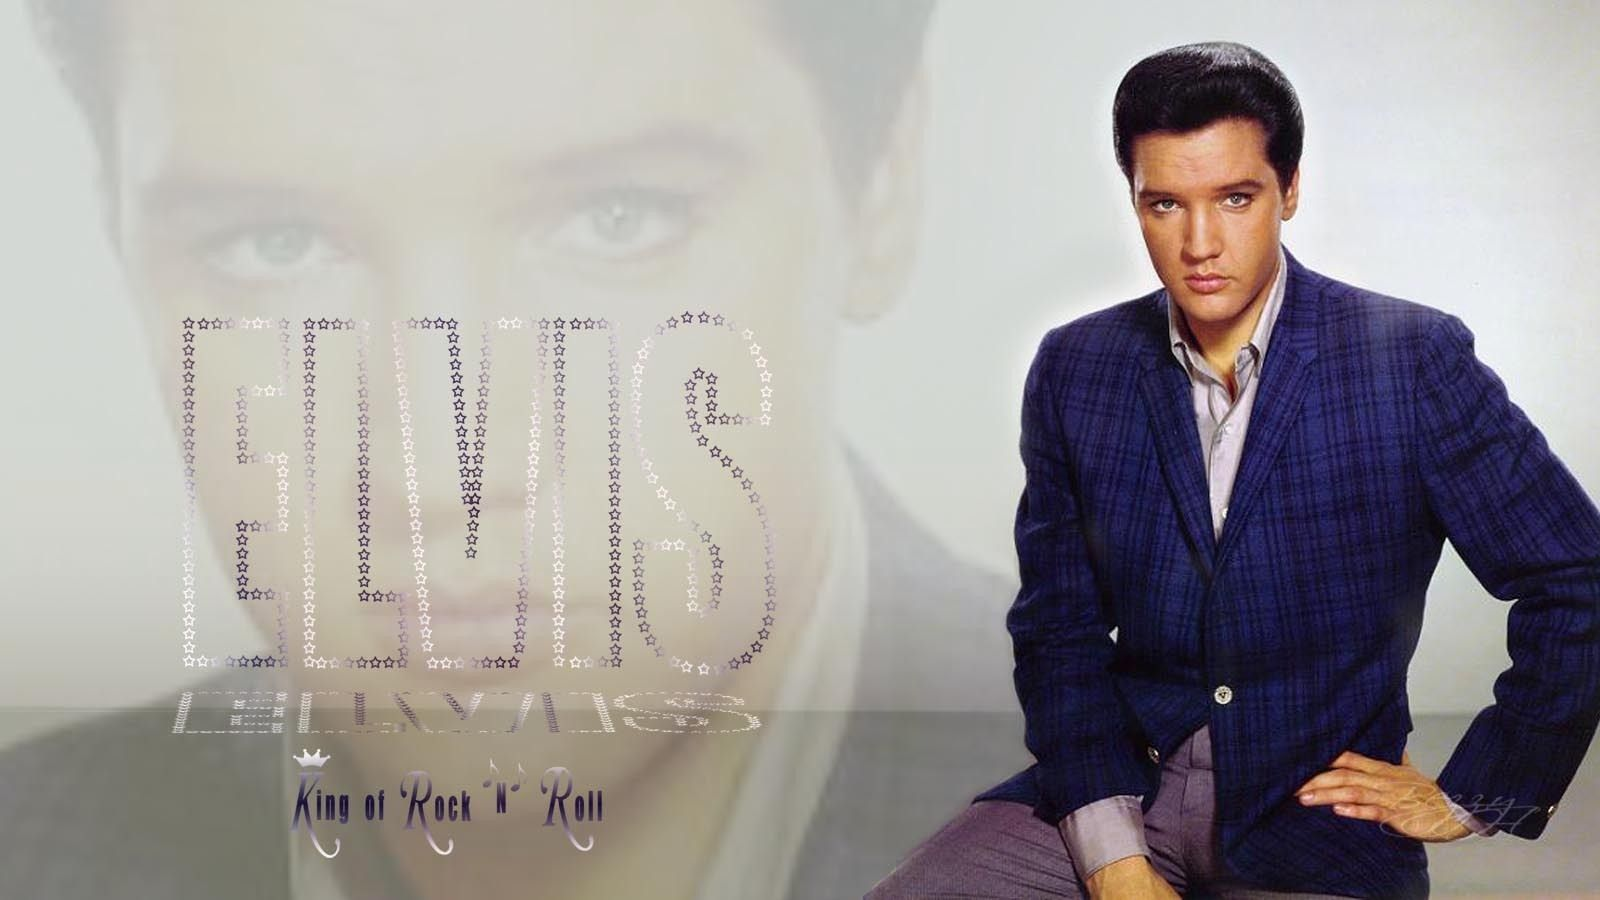 Image detail for -Black Elvis Aaron Presley - King of Rock and Roll desktop Wallpaper